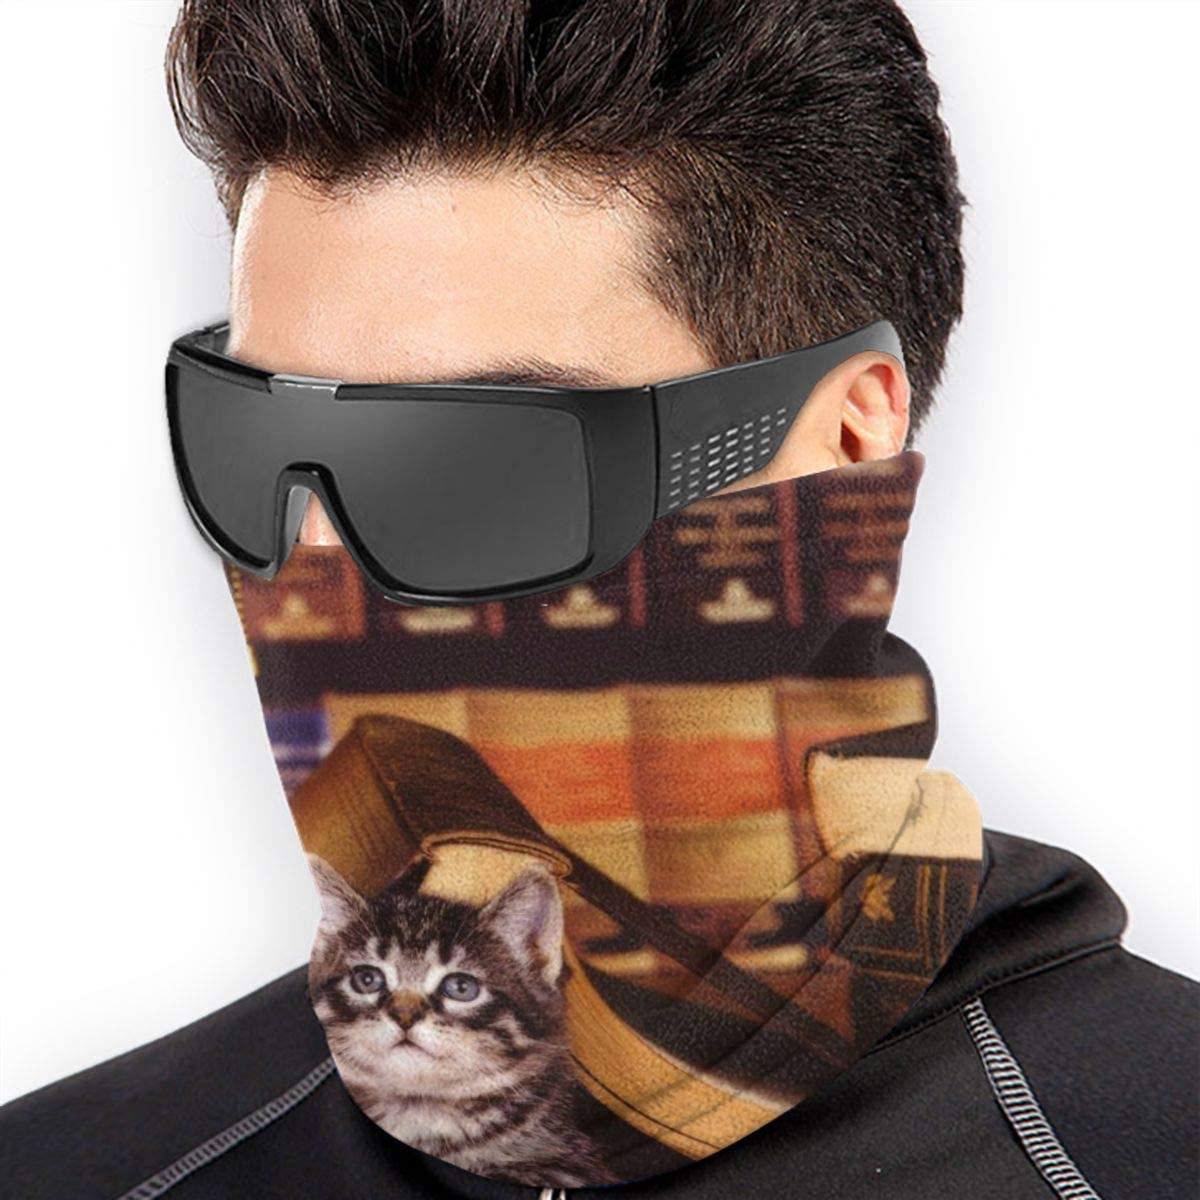 Bookish Kitten Neck Gaiter Headwear Headband Head Wrap Scarf Mask Neck/Ear Warmers Headbands Perfect For Winter Fishing, Hiking, Running, Motorcycle Etc& Daily Wear For Men And Women